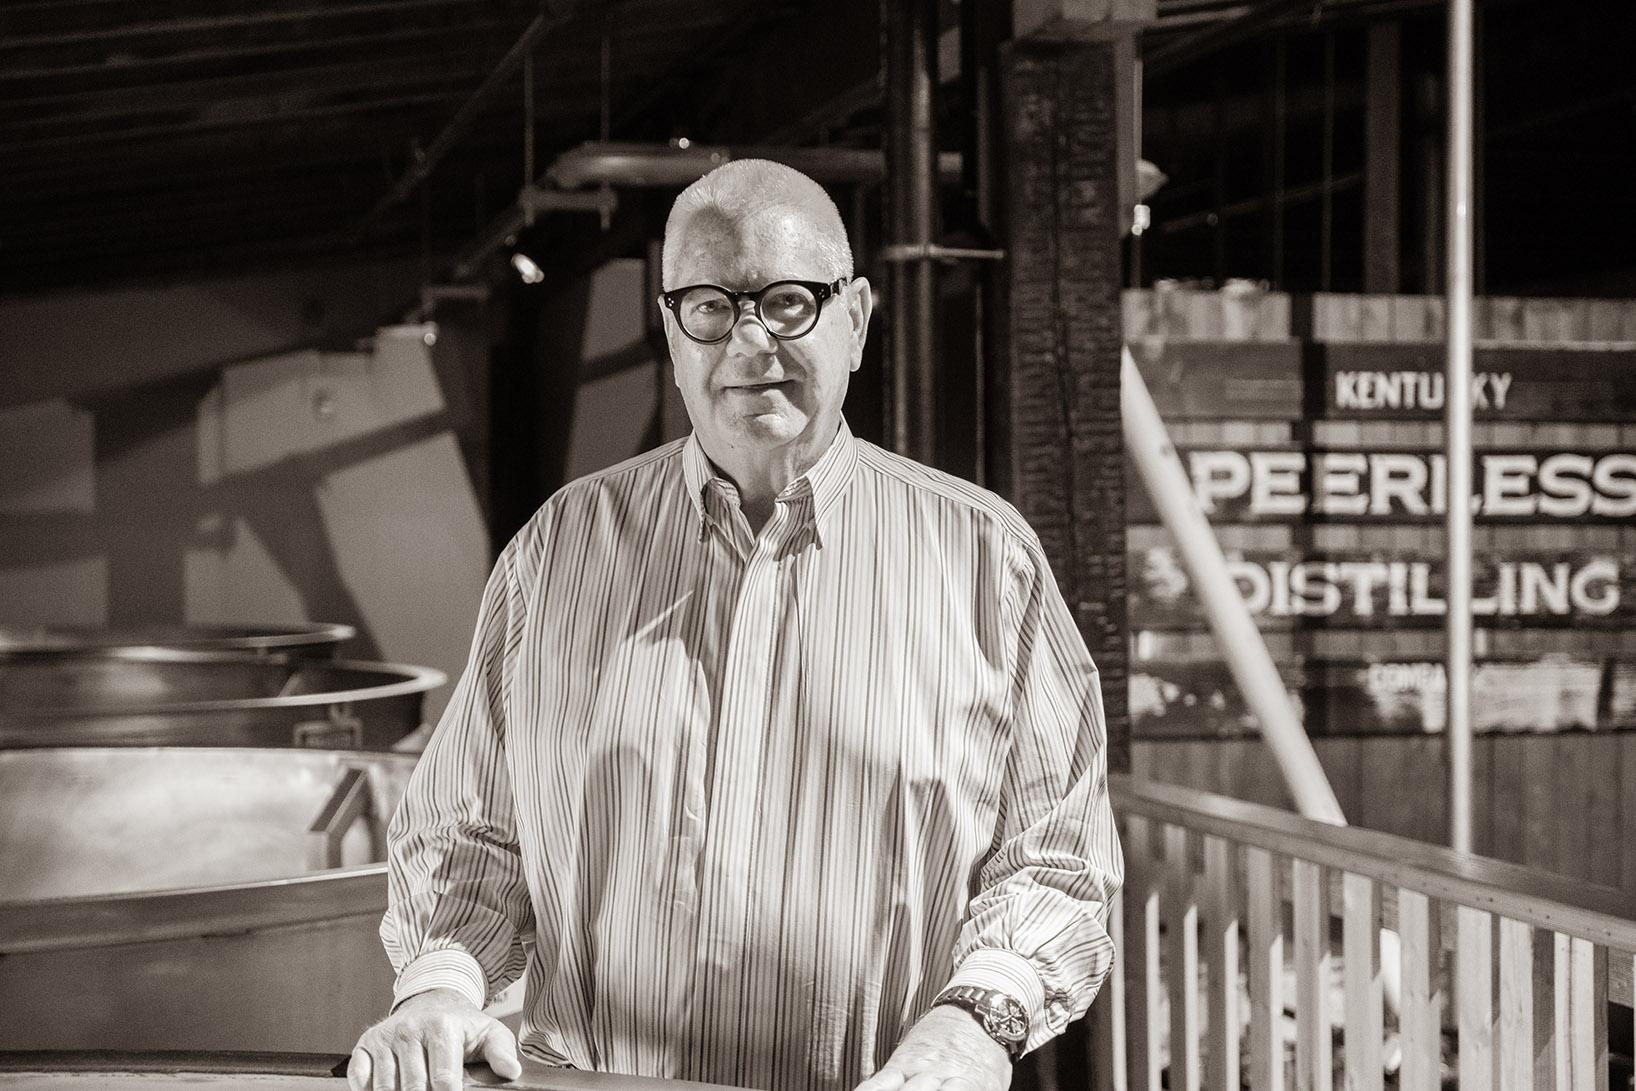 Corky Taylor Kentucky Peerless Distilling Co